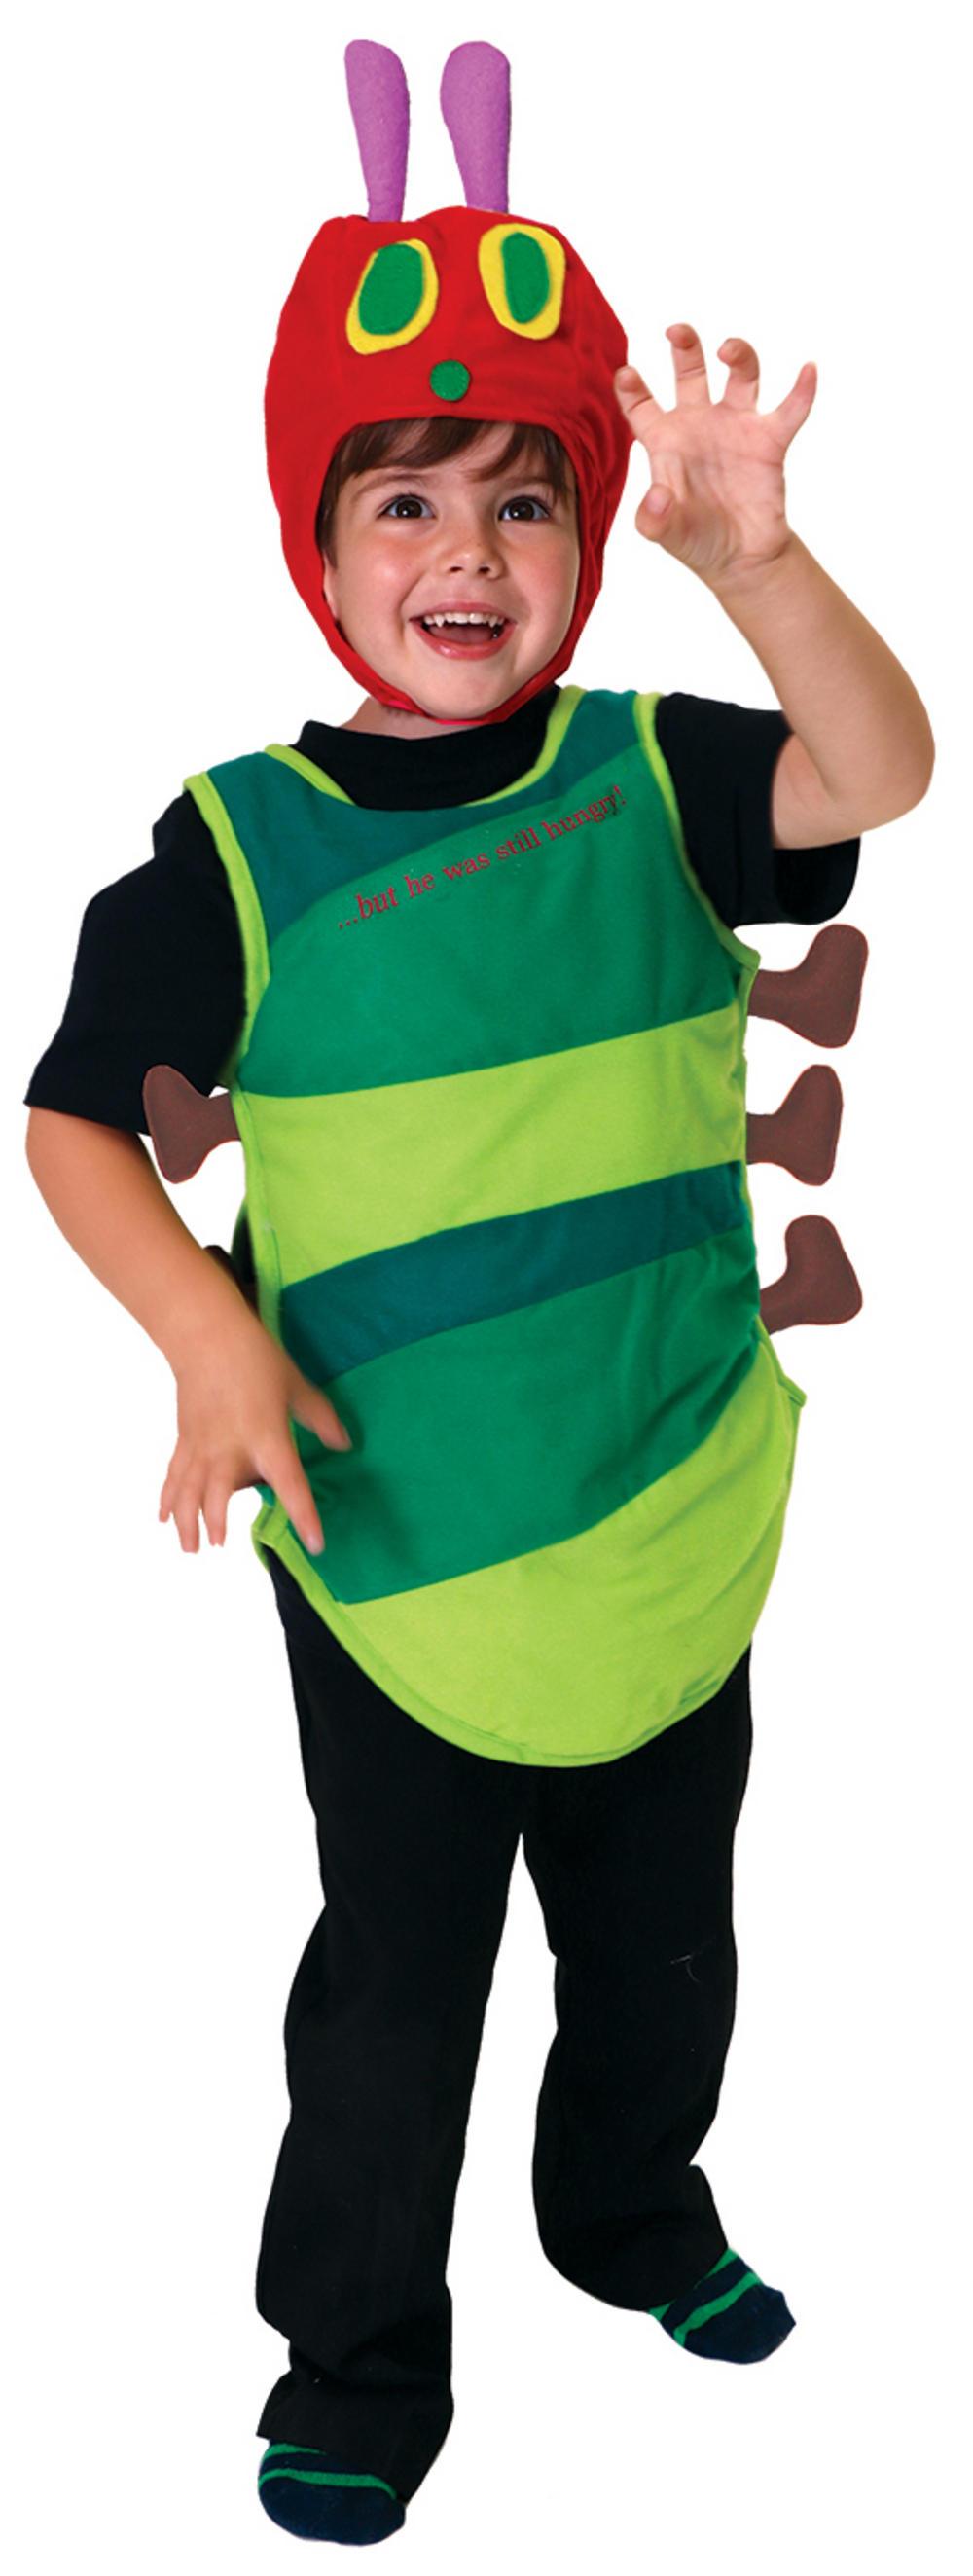 The Very Hungry Caterpillar Kids Costume